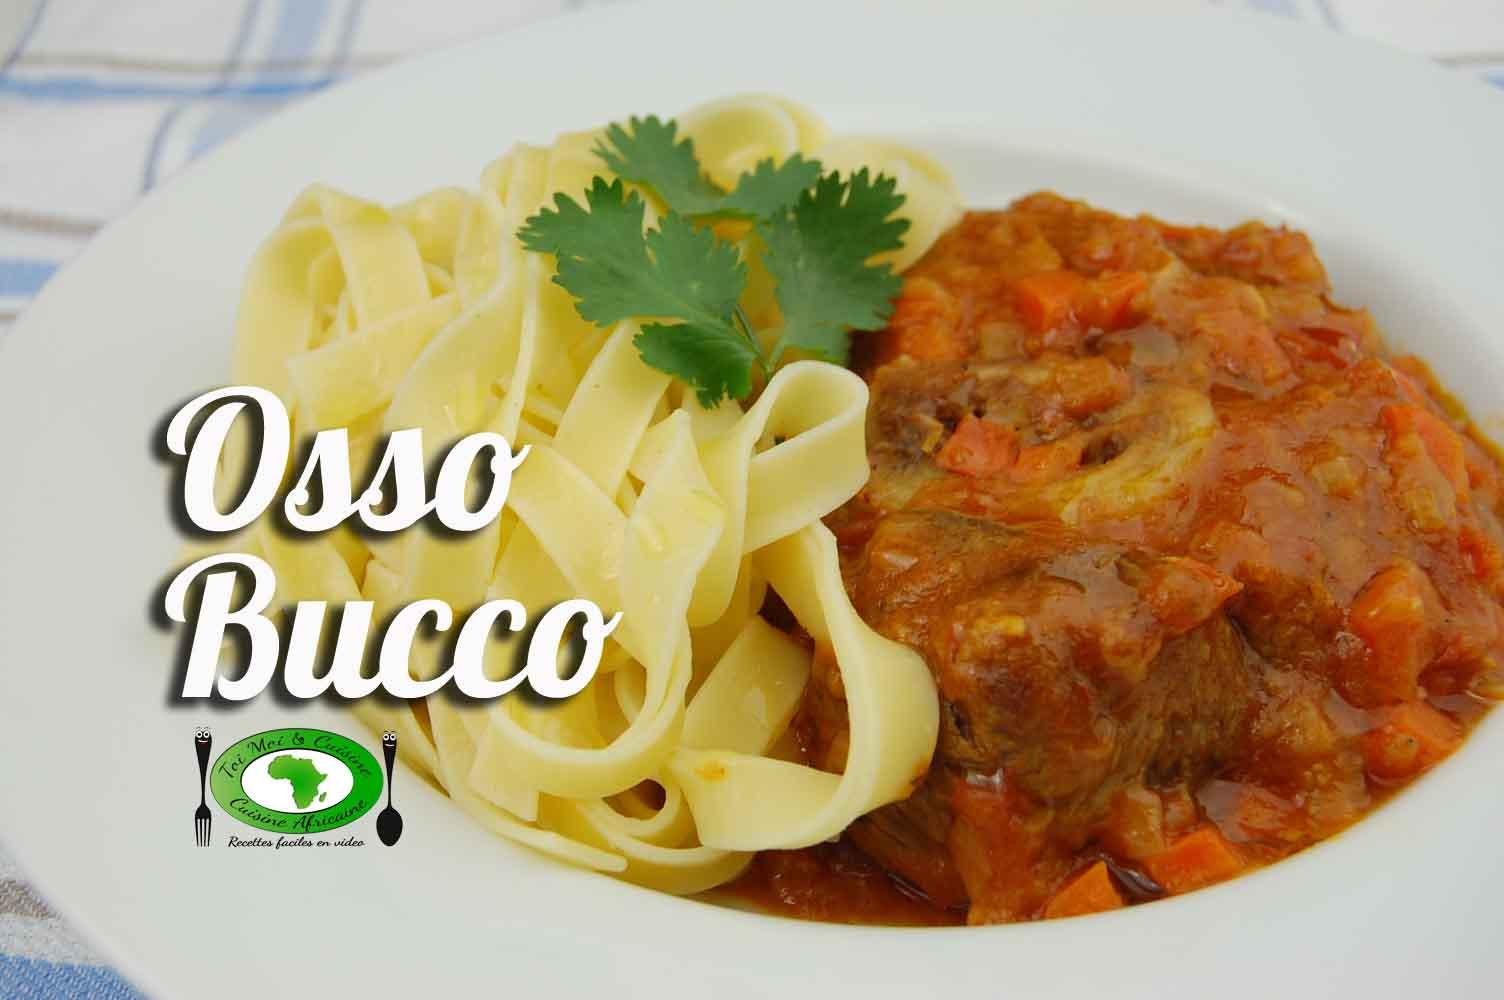 Osso bucco tchop afrik 39 a cuisine - Cuisine italienne osso bucco ...